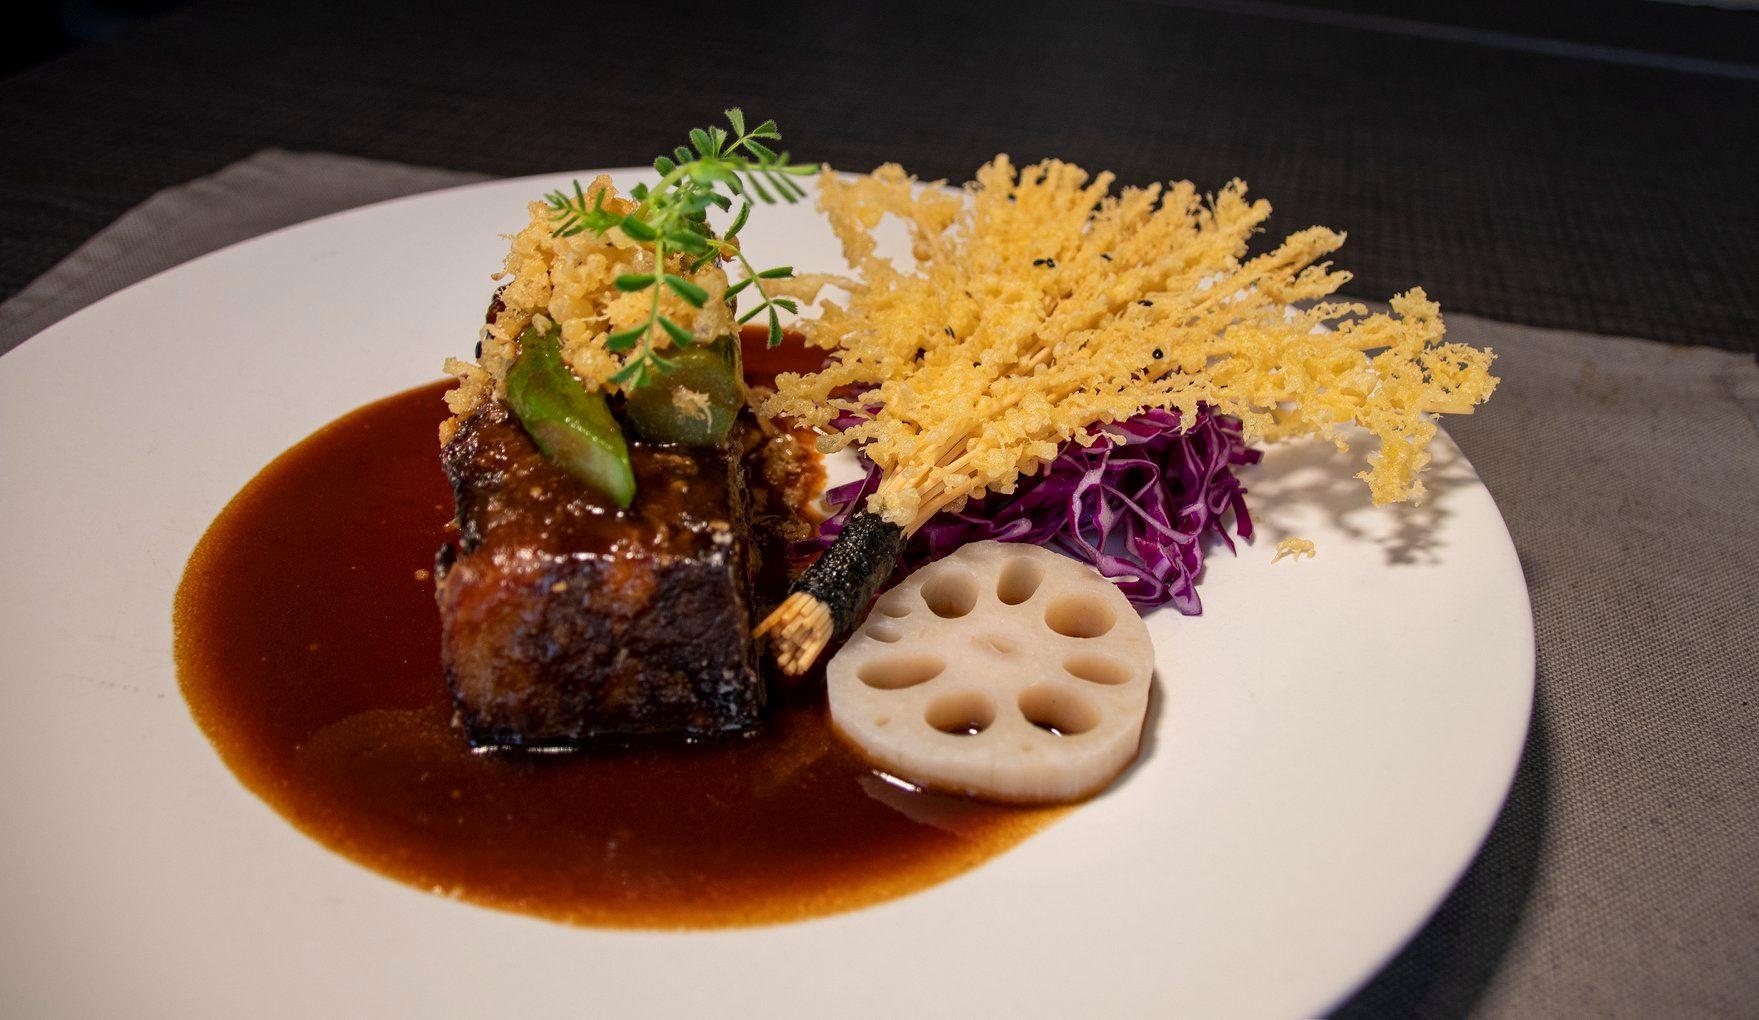 mesa-habla-etereo-pedro-nel-rabo-vaca-salsa-teriyaki